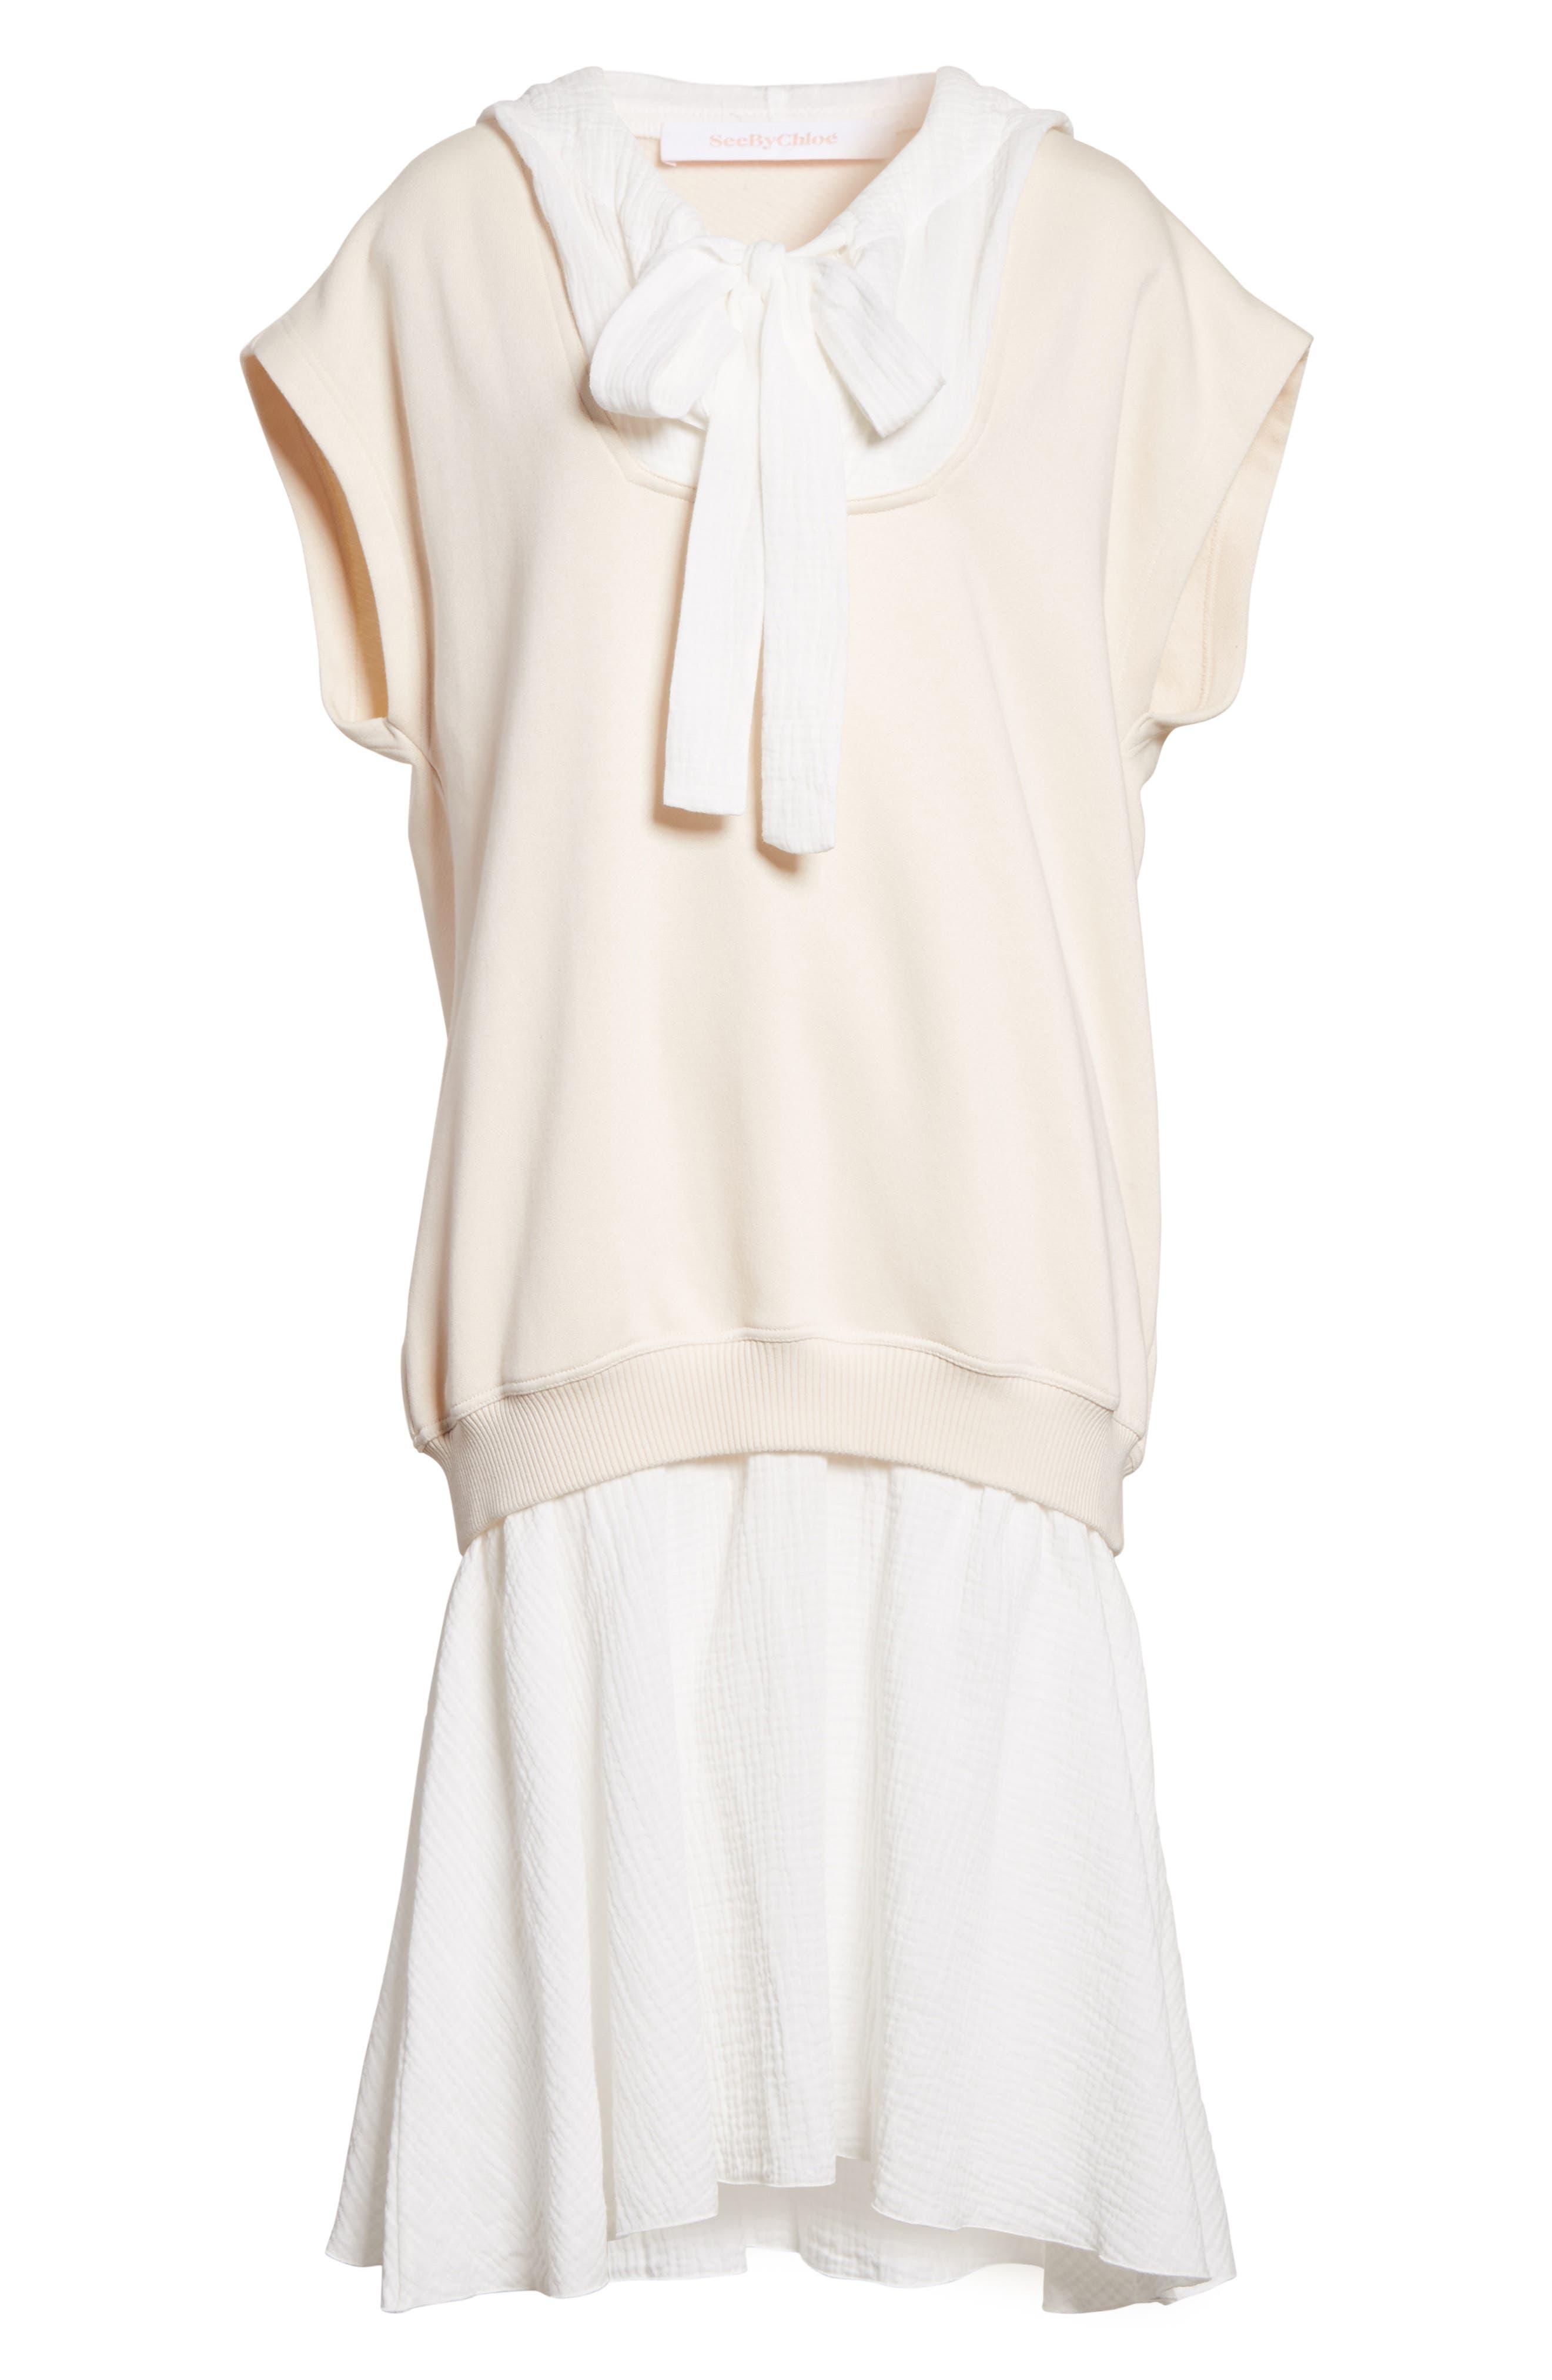 Hooded Sweatshirt Overlay Dress,                             Alternate thumbnail 6, color,                             170